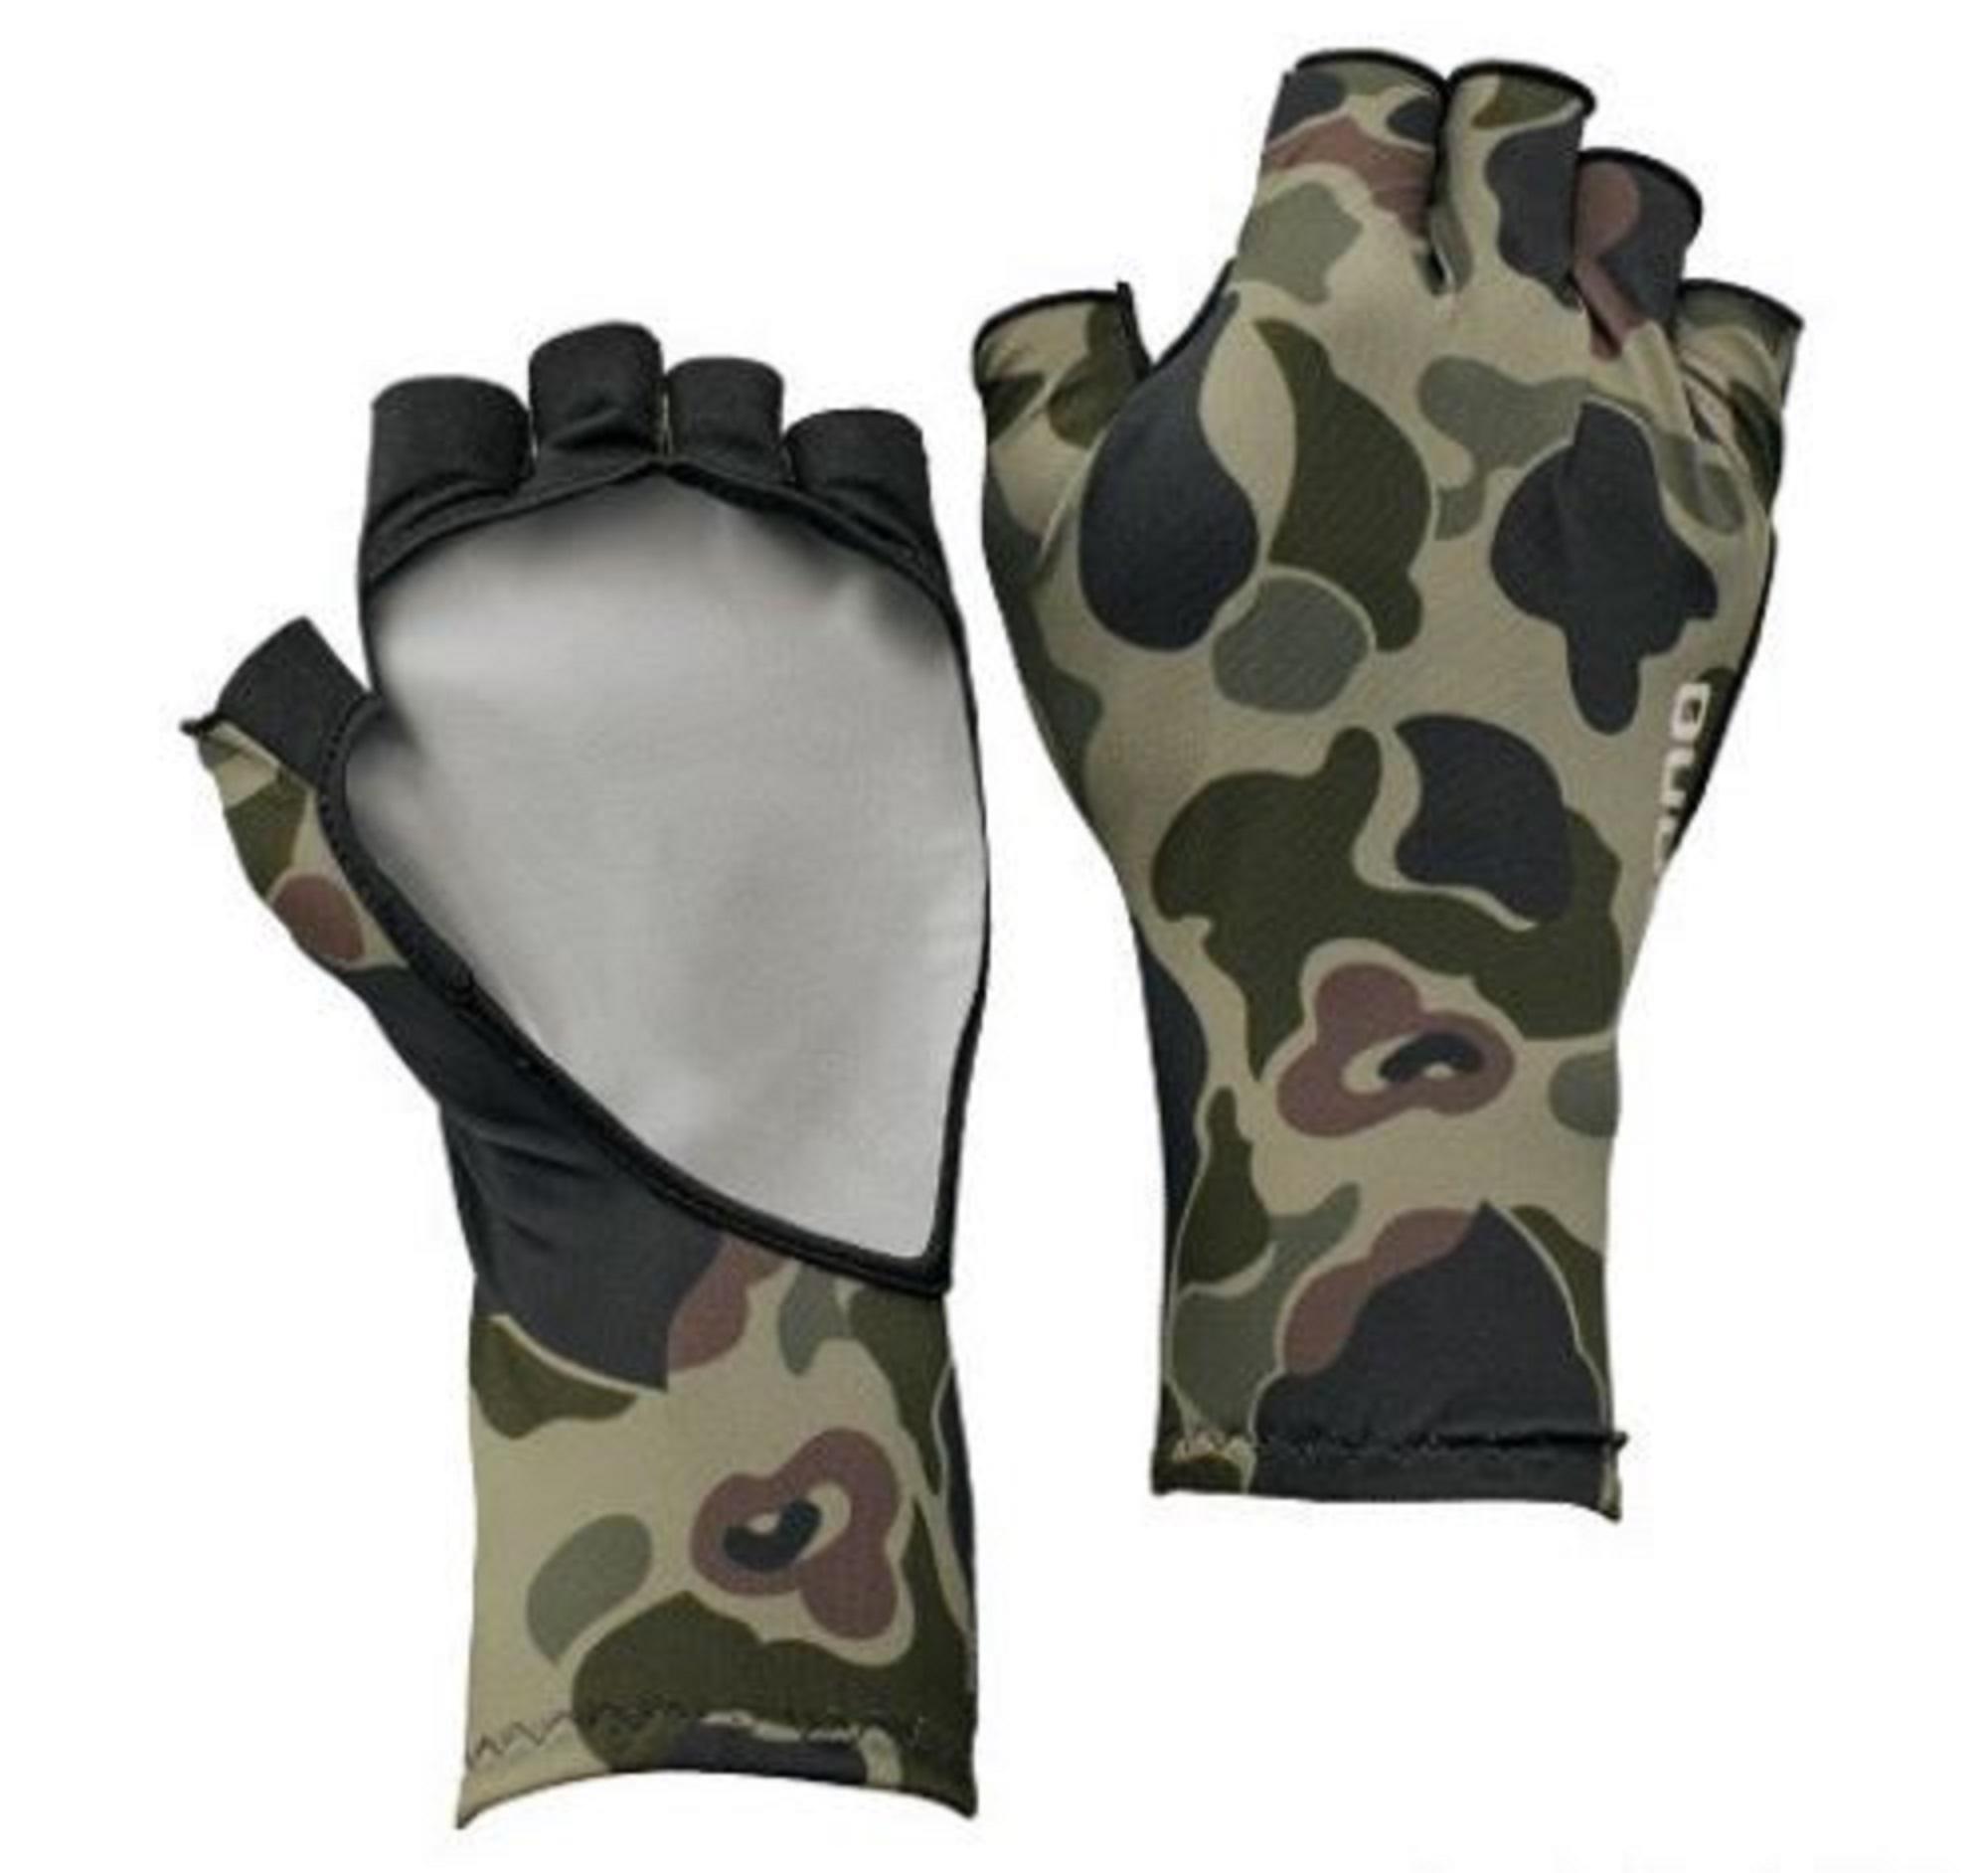 Shimano GL-048Q Gloves UPF 50 5 Fingerless Green Camou Size XL 669872